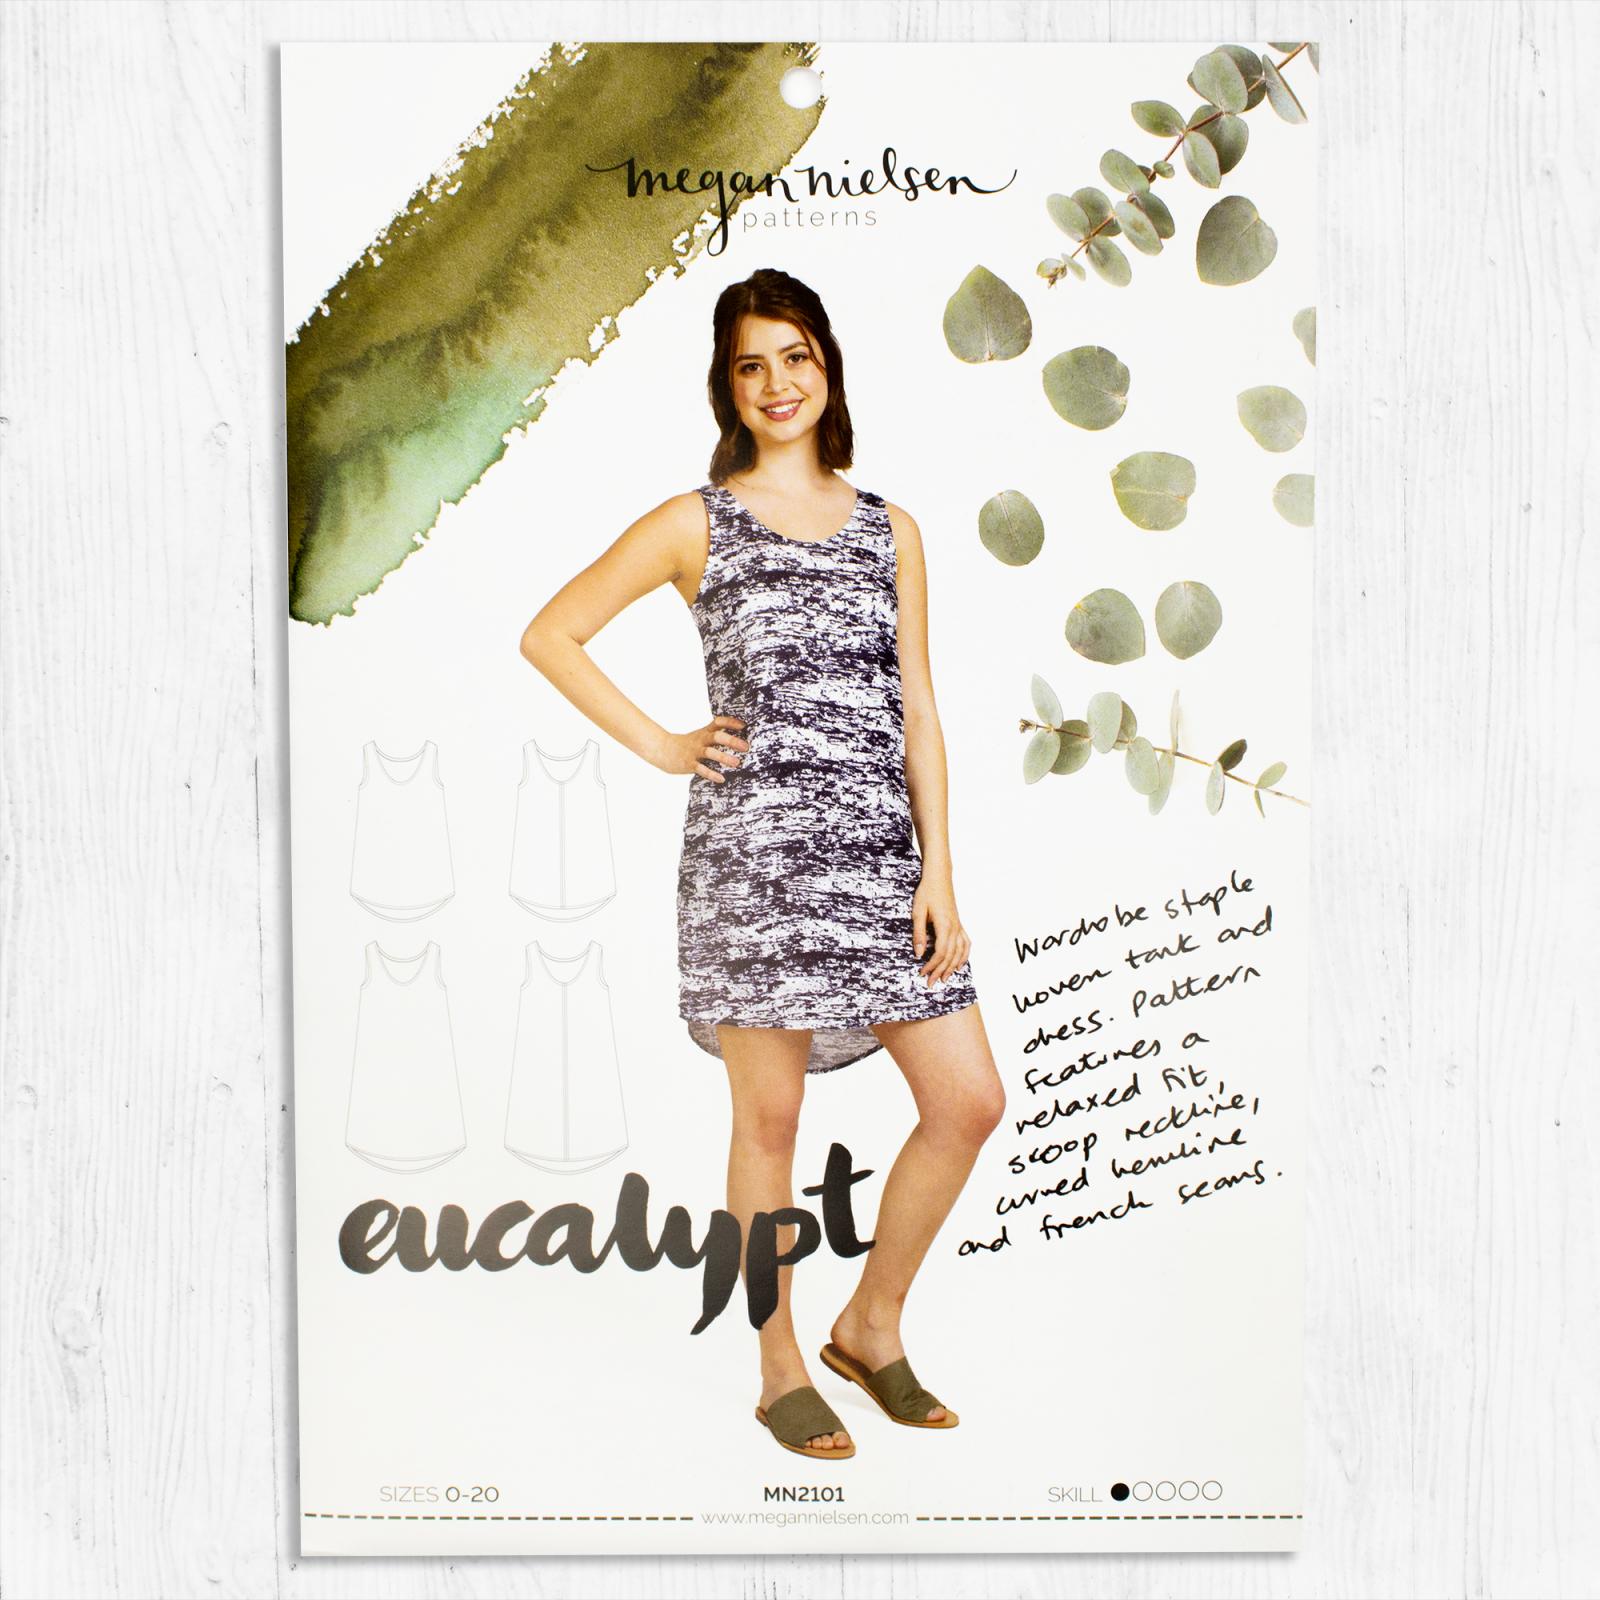 Megan Nielsen Patterns - Eucalypt Woven Tank & Dress